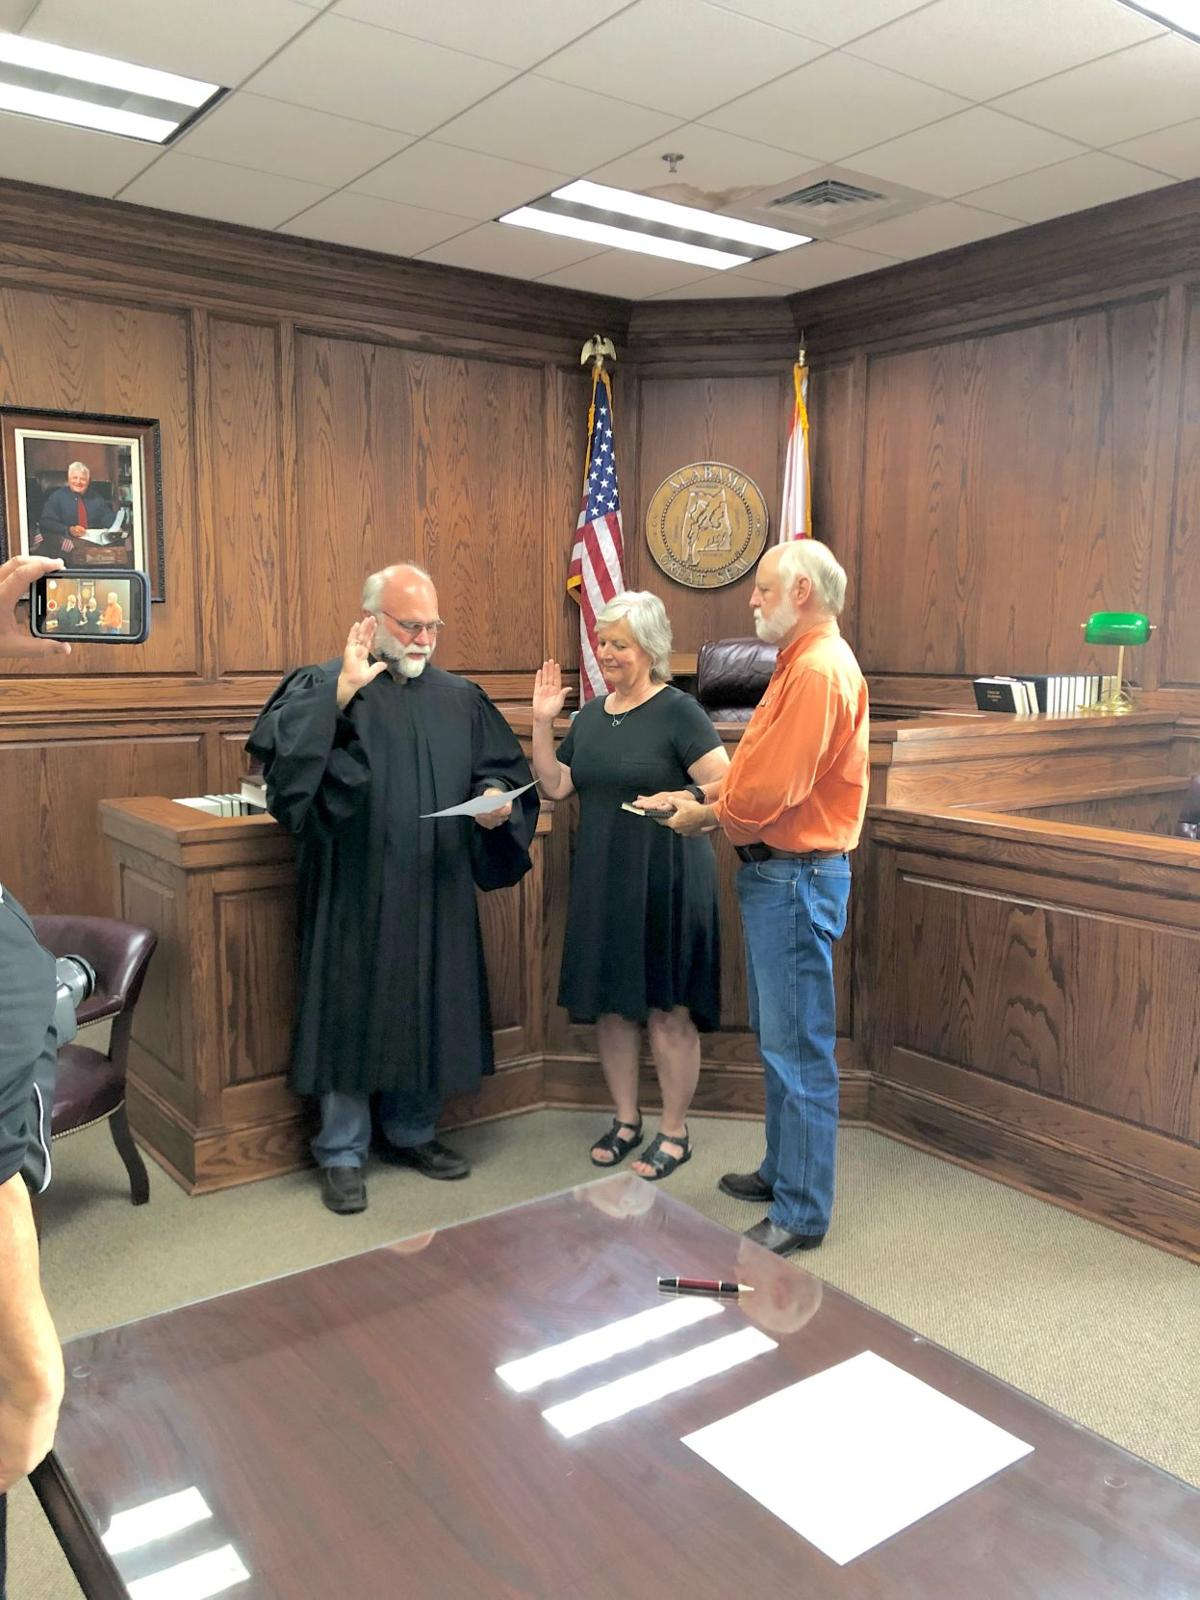 Board of registrars sworn in last week